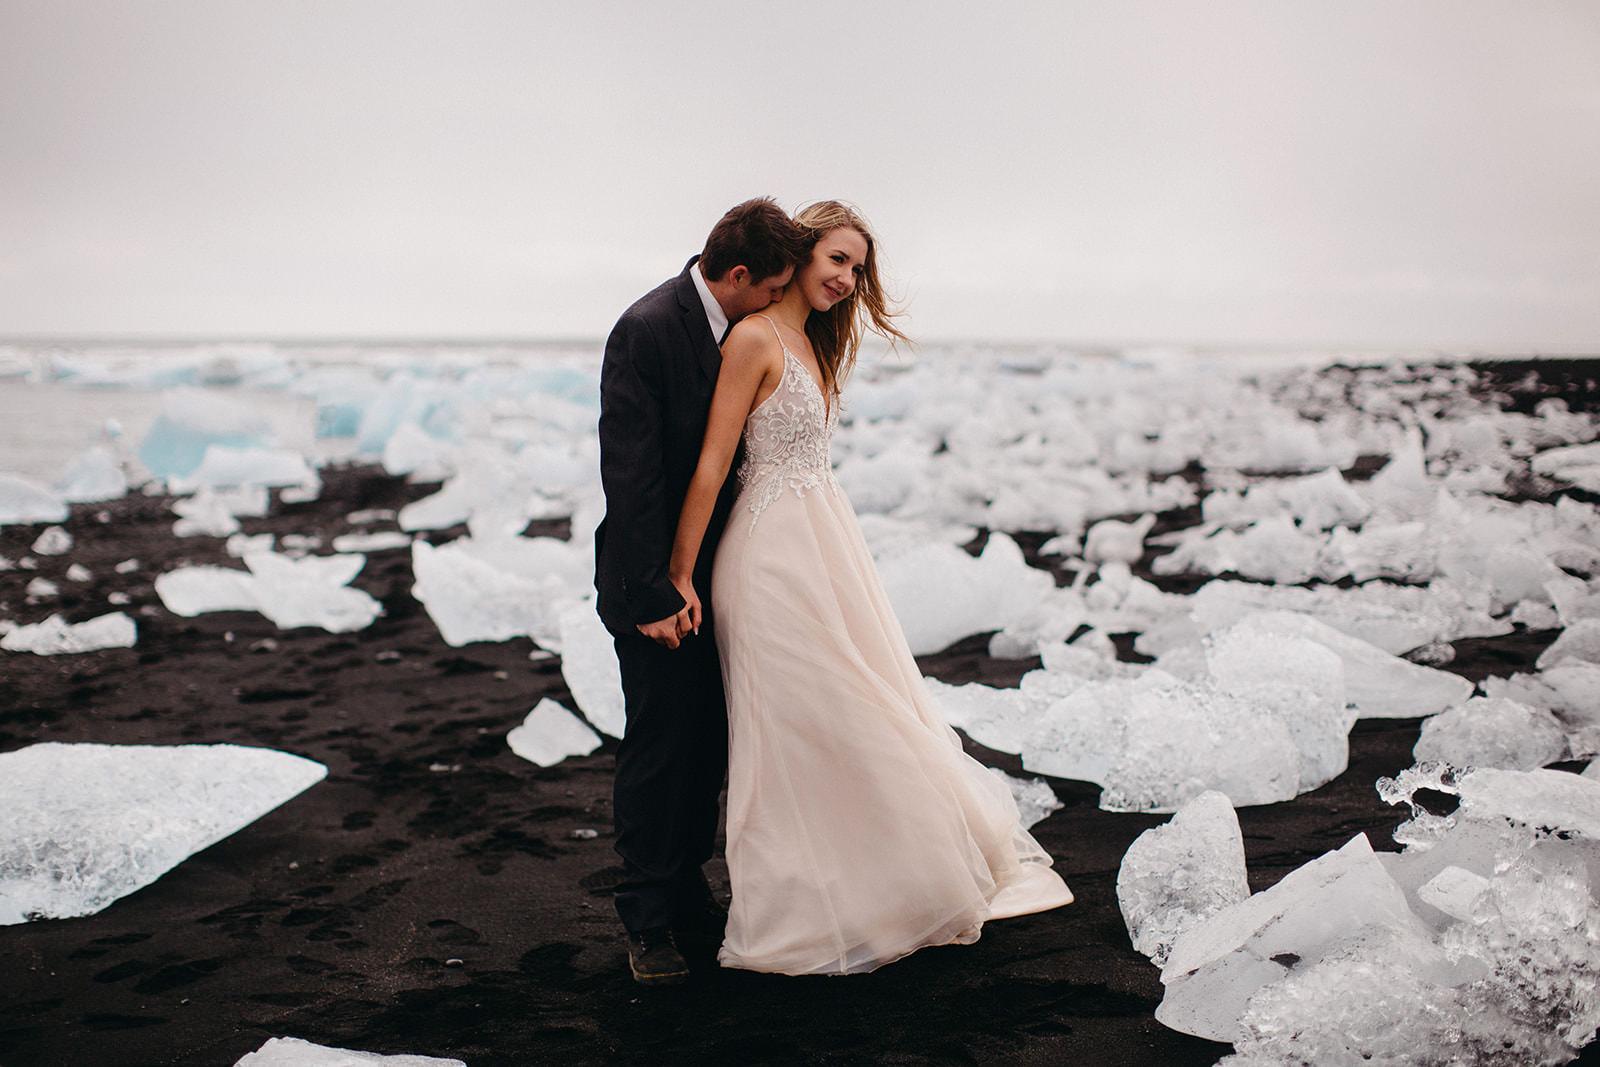 Icelandic Iceland Elopement Wedding Elope Photographer Eloping Reykjavík Vik Black Sand Beach Jökulsárlón Skogafoss Waterfall Vestrahorn Mountain Liz Osban Photography Destination 57.jpg